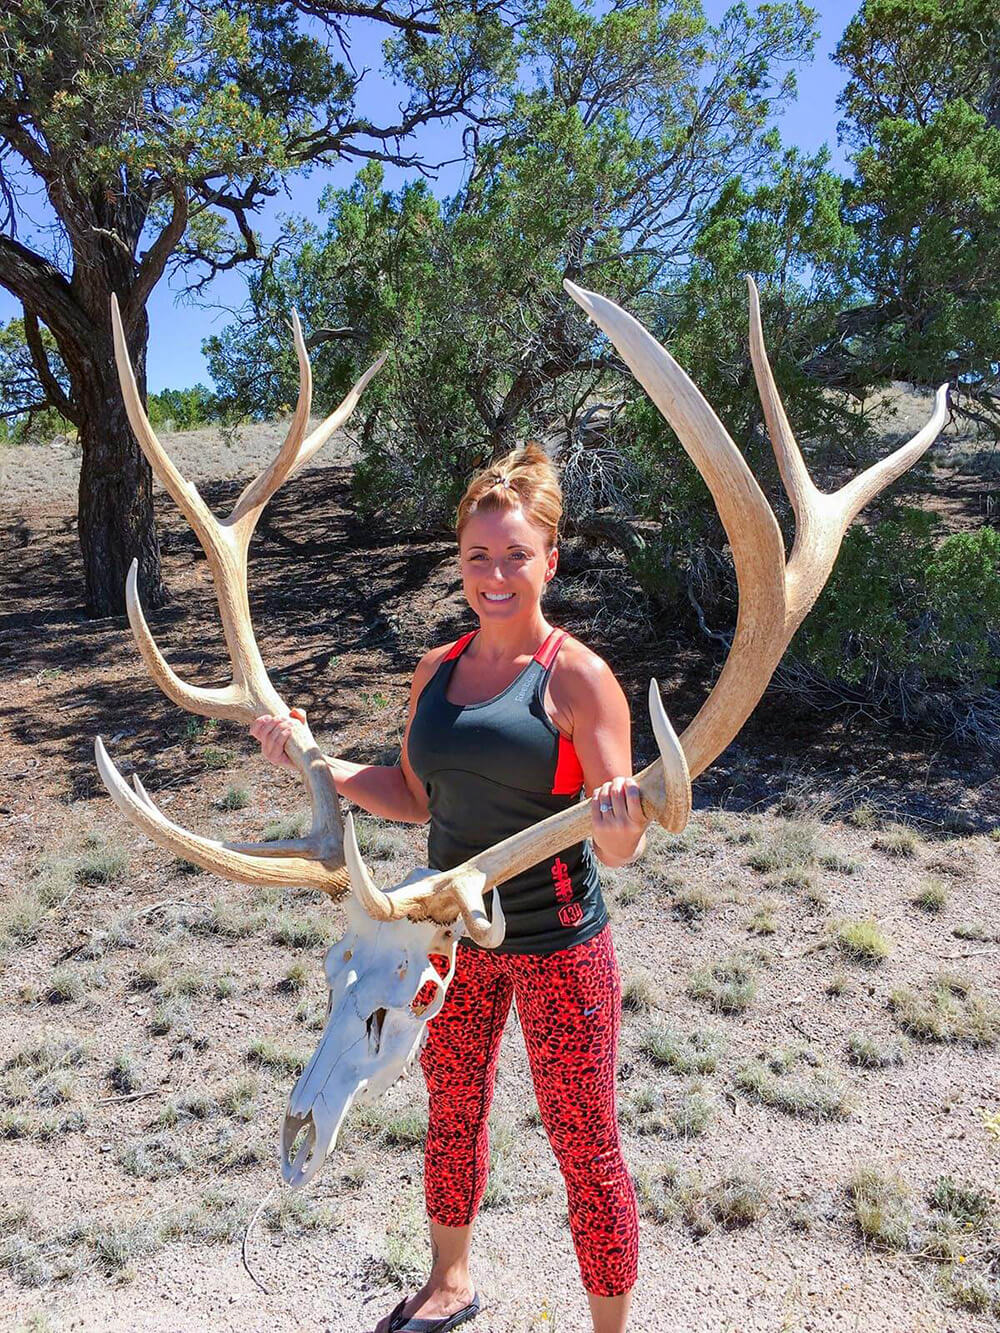 elk in mexico hunt